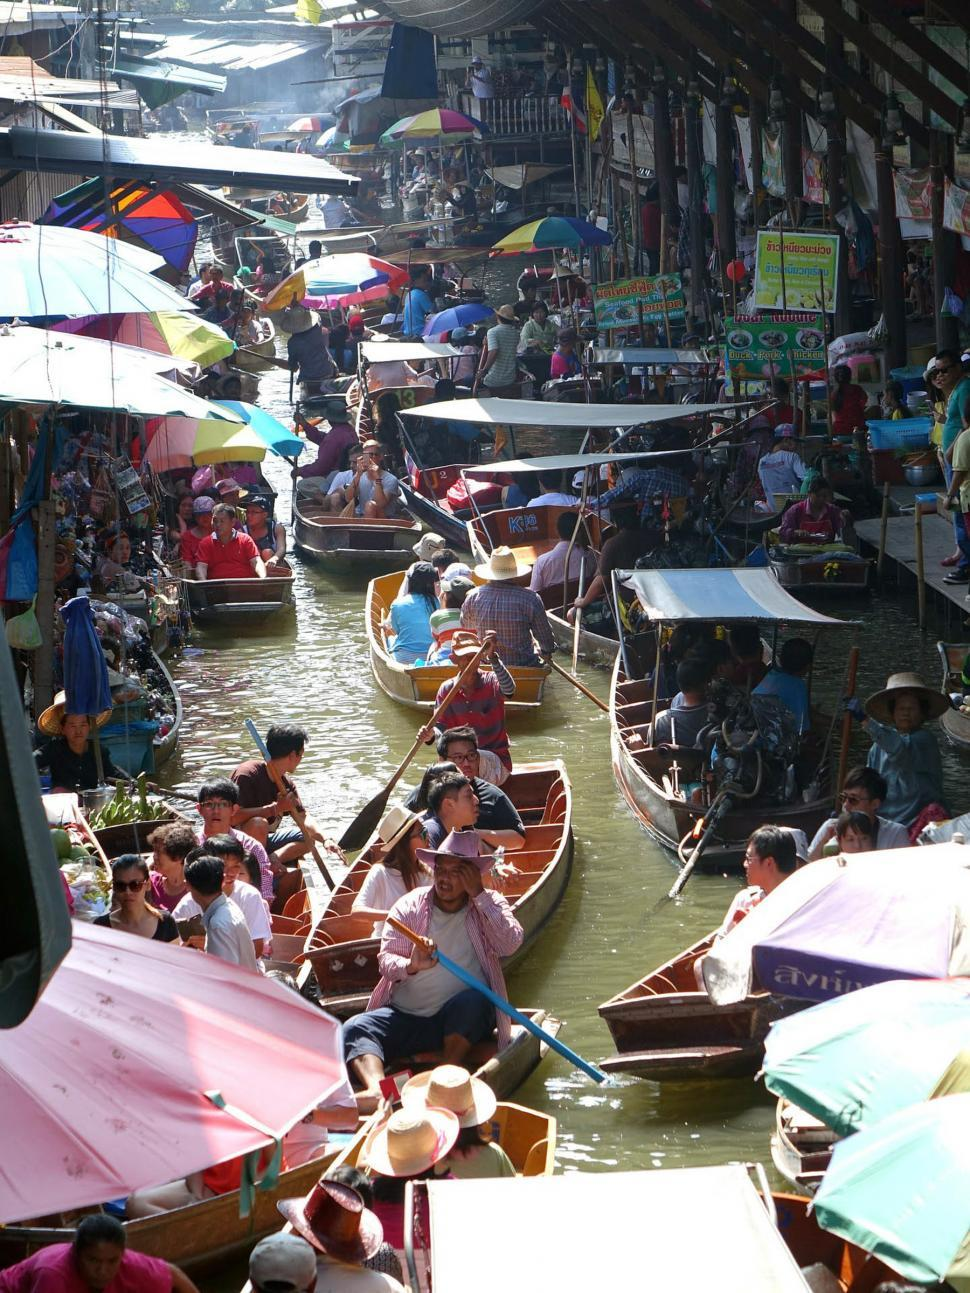 Download Free Stock Photo of Bankok, Thailand - Damnoen Saduak Floating Market